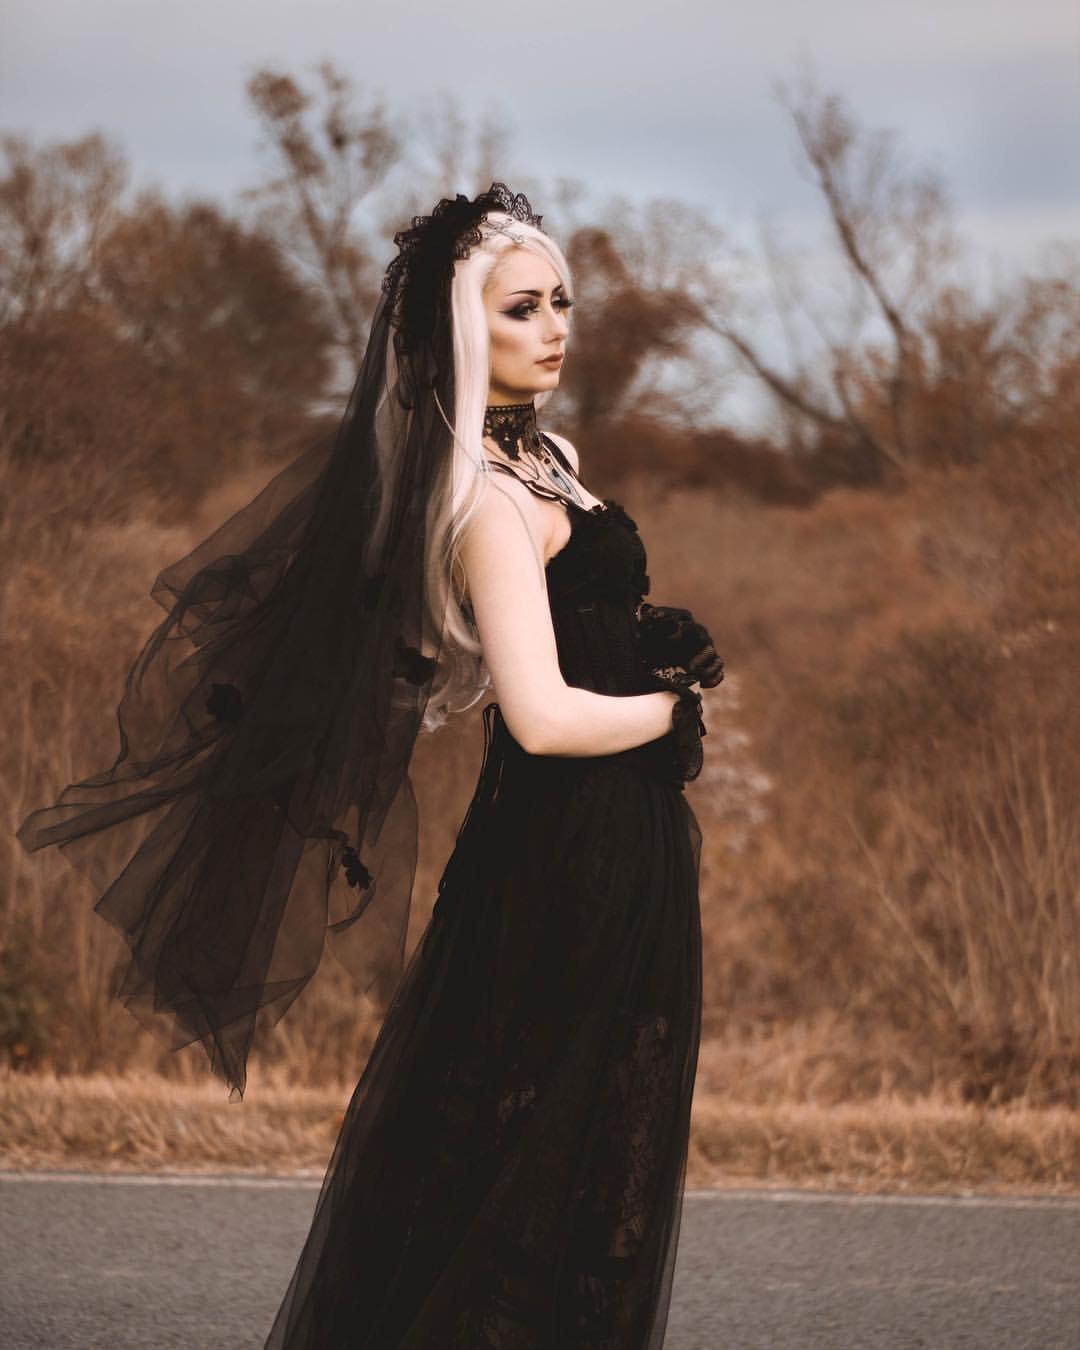 AHW004 Gothic bride cross veil by DARK IN LOVE (Image #4)